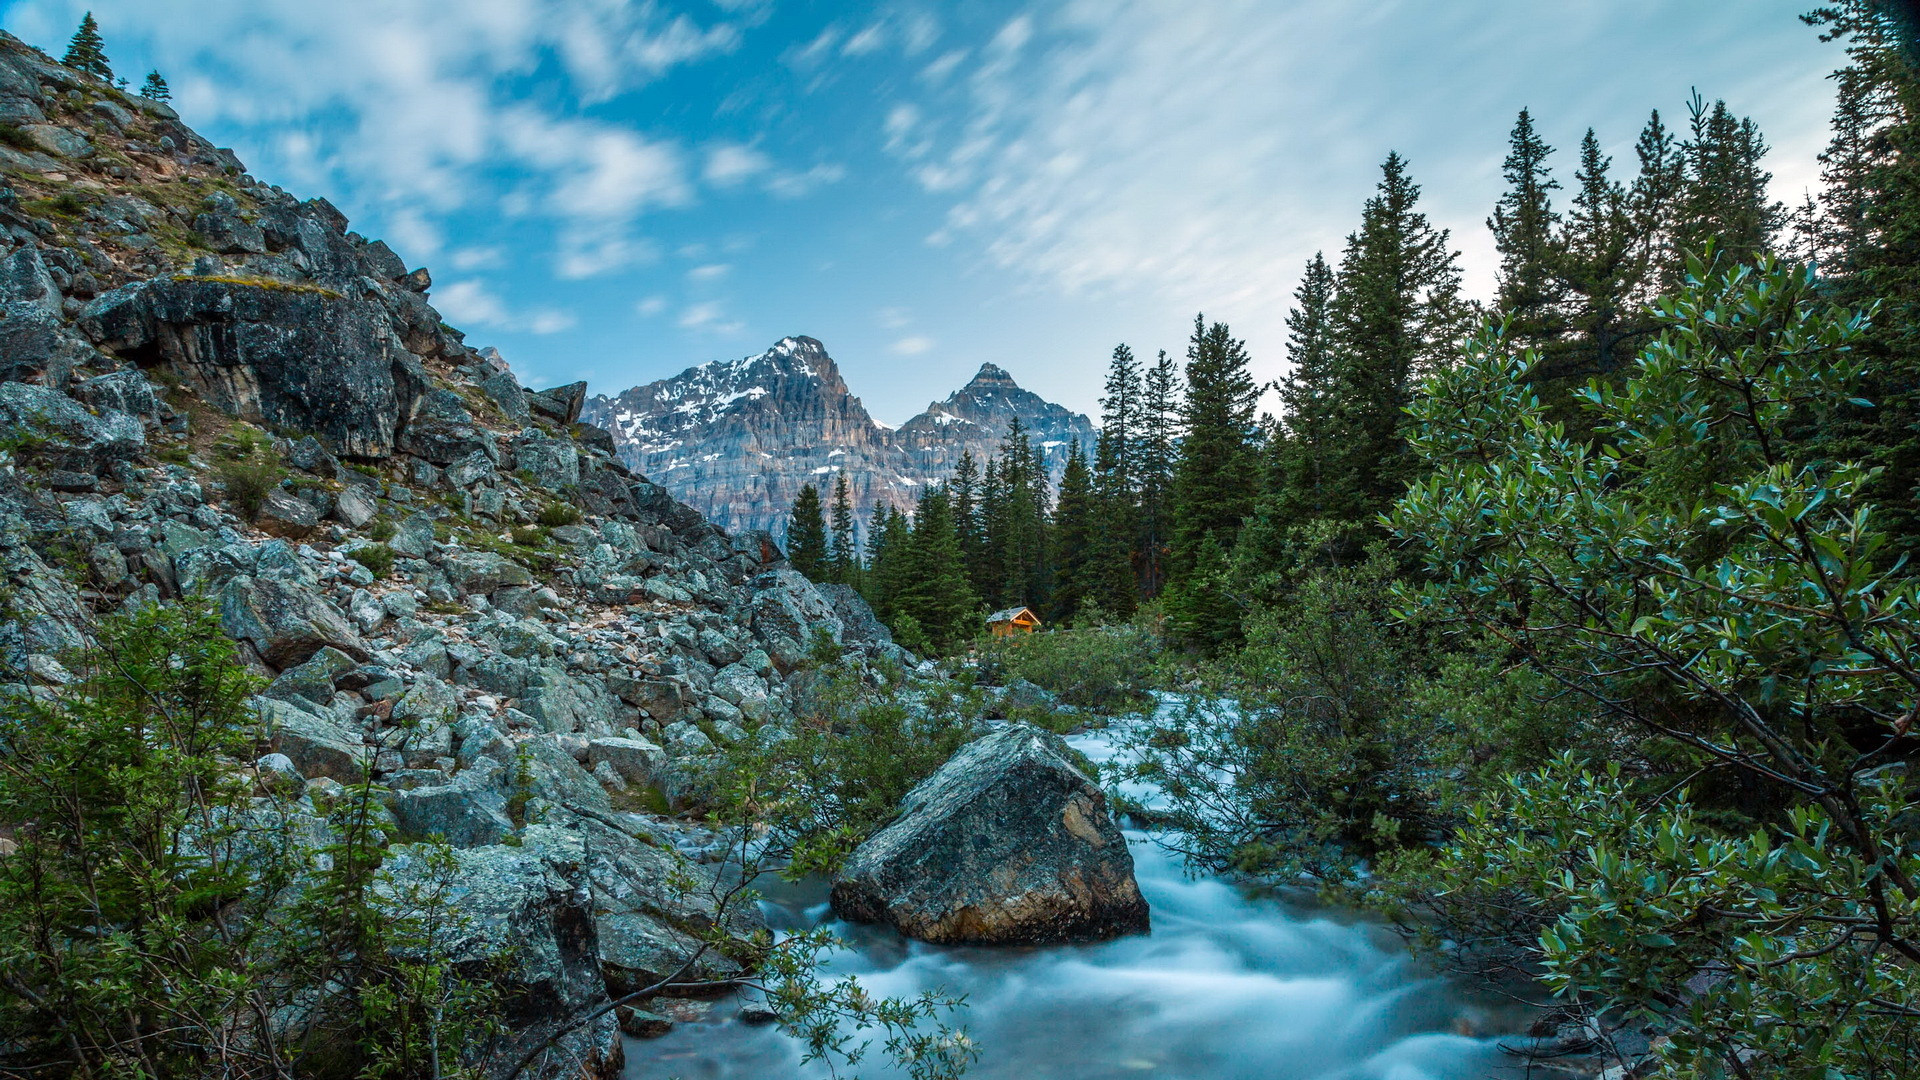 Rocky Mountains 27888 1920x1080 px